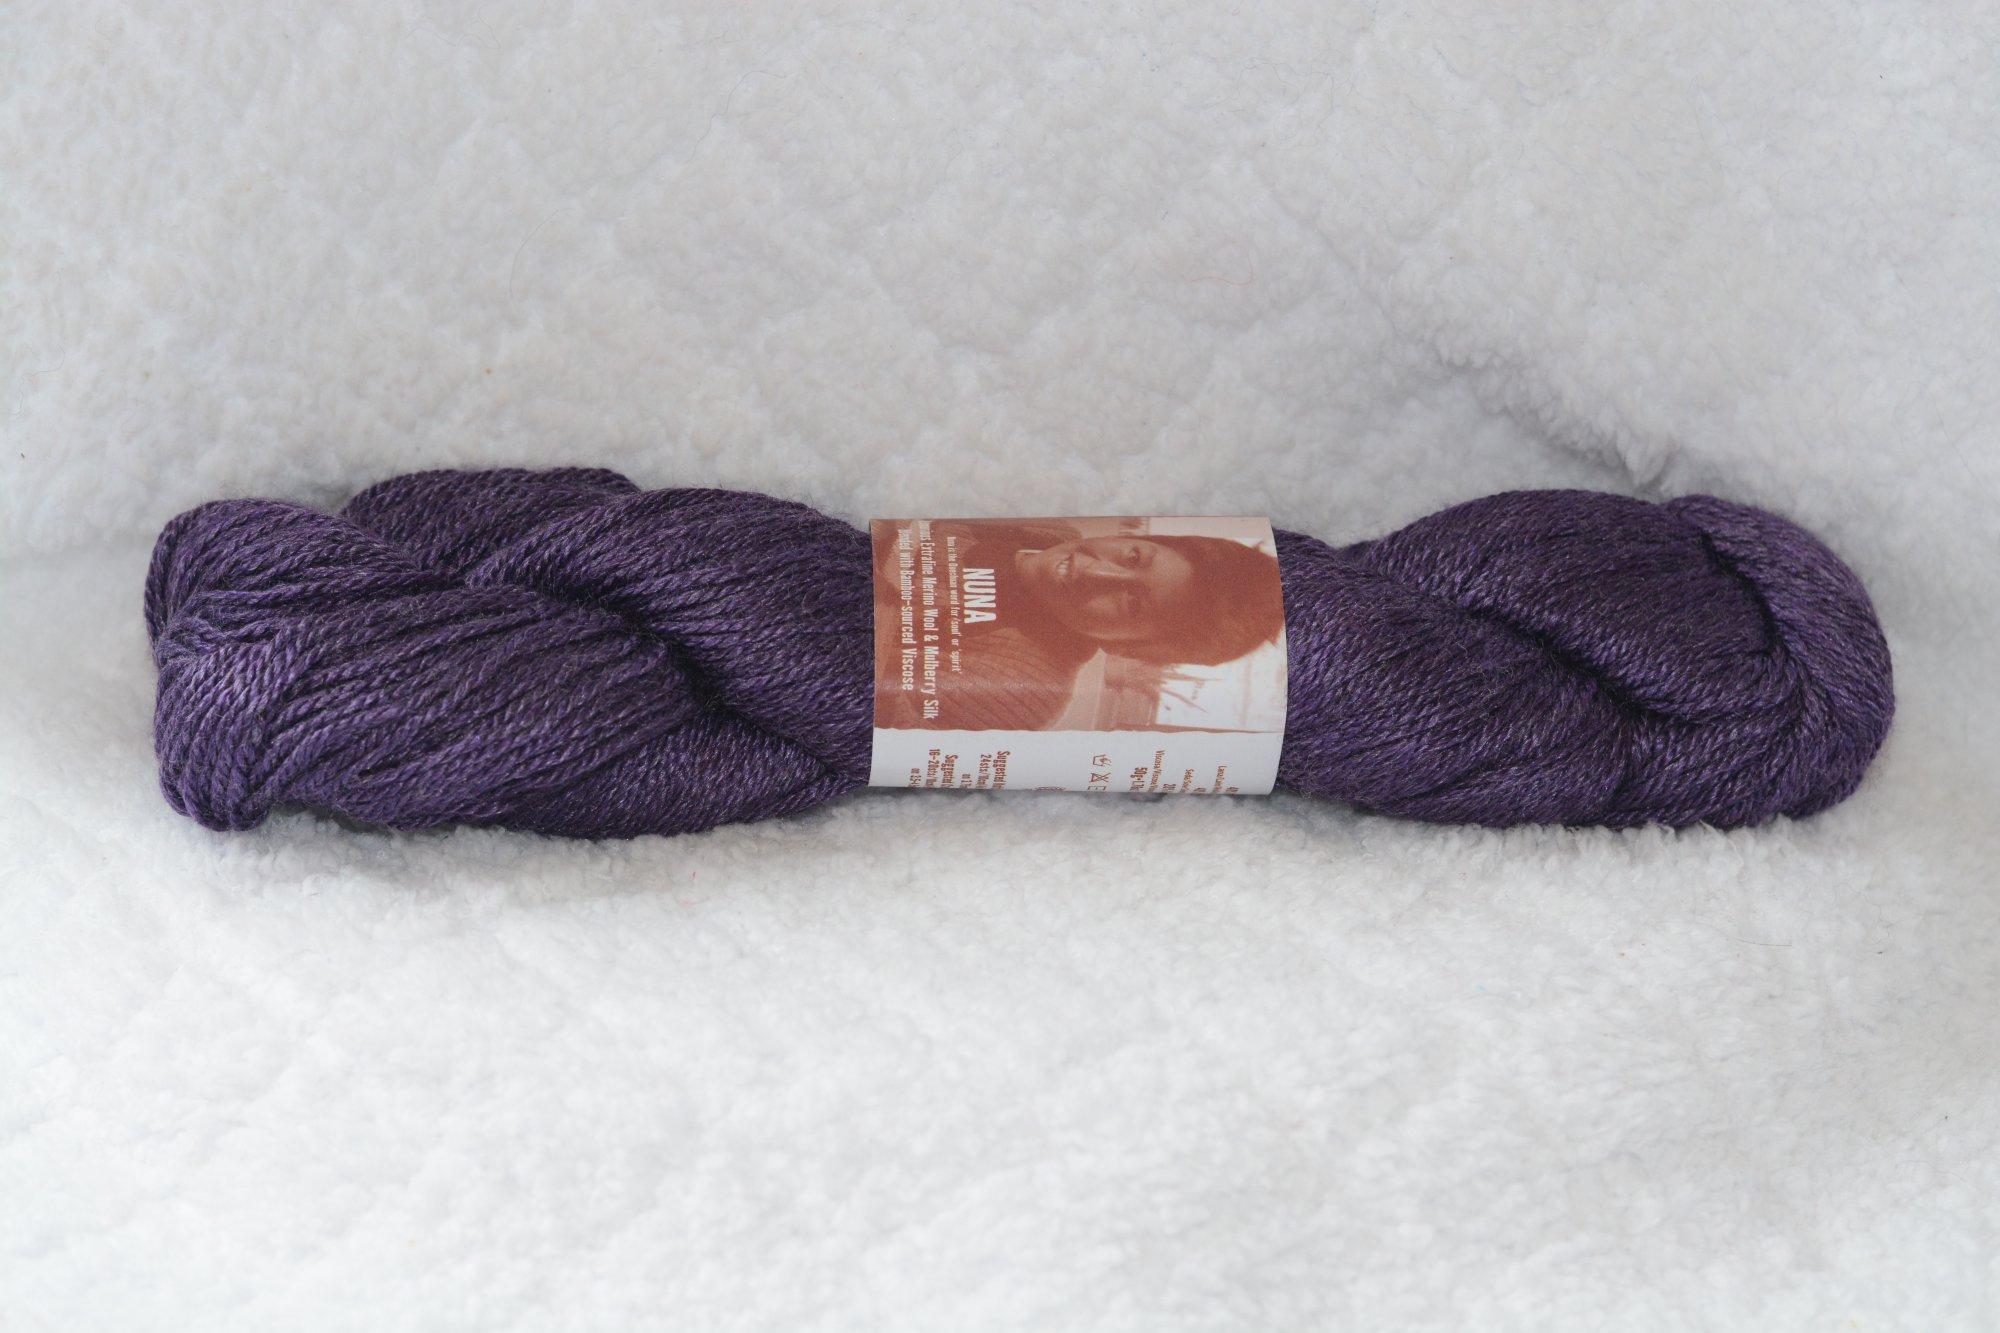 Nuna - Color 73 - bluebell